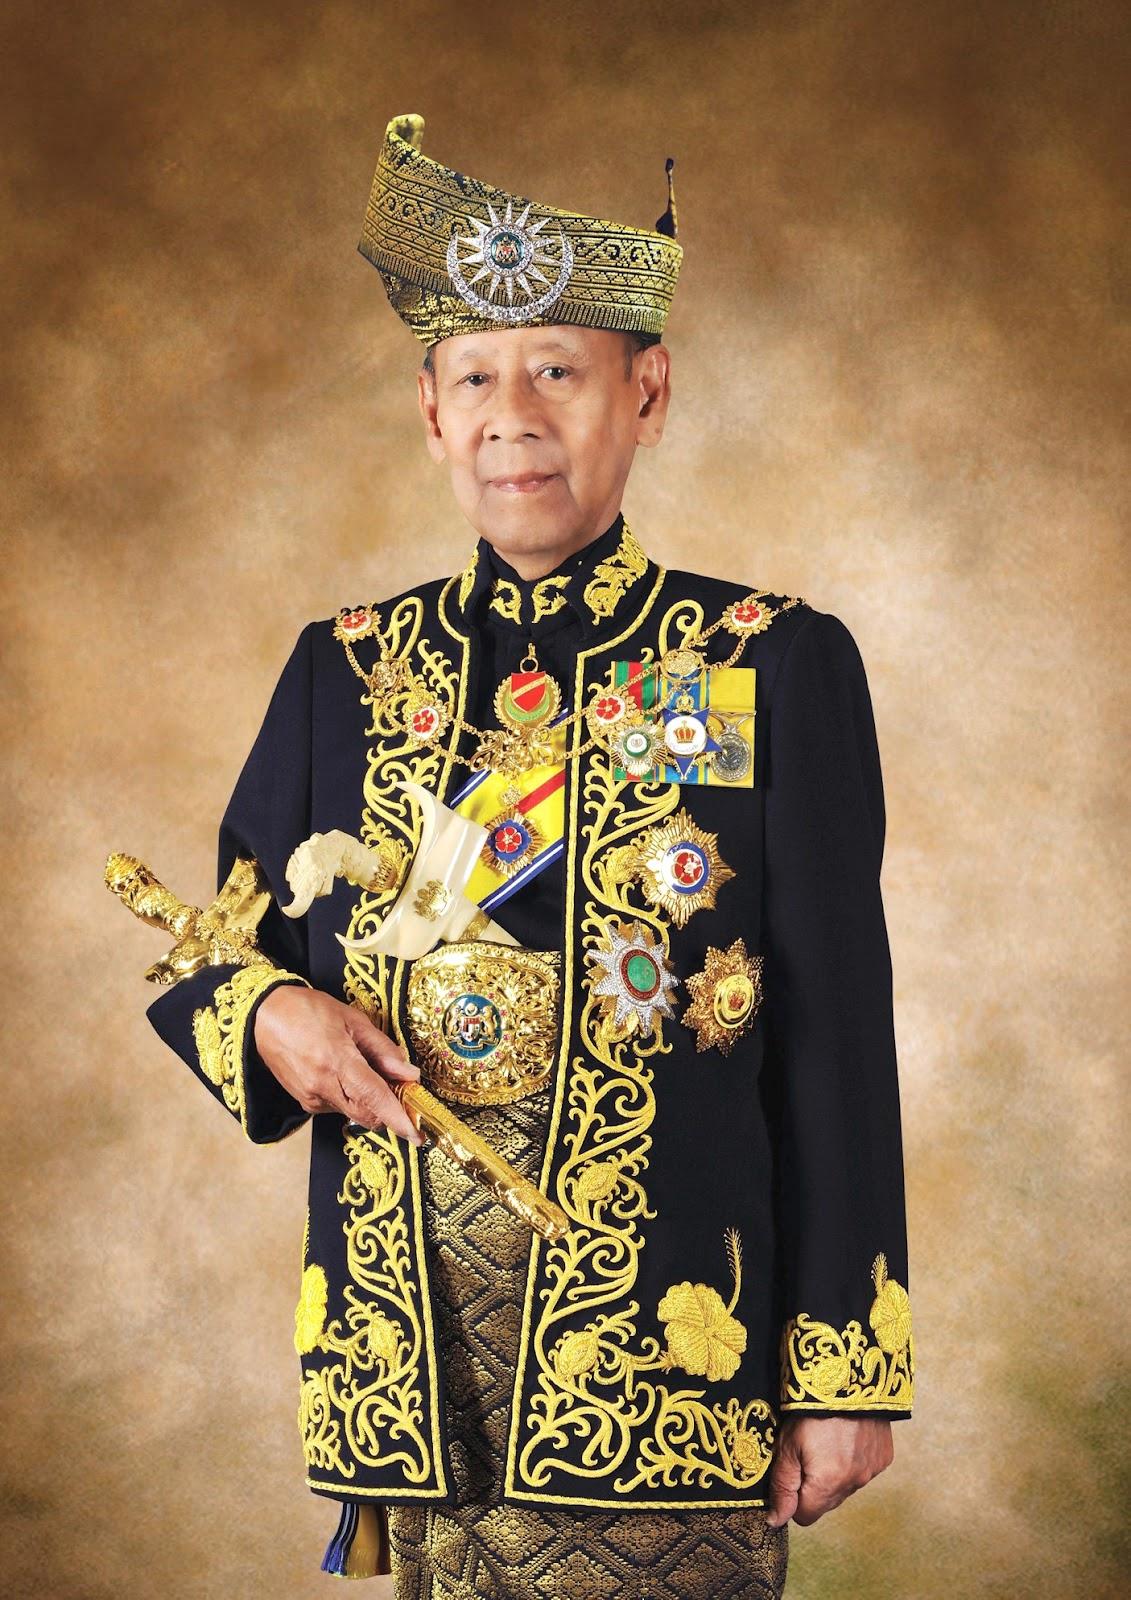 SPB Tuanku Abdul Halim menjadi Agong buat kali keduanya